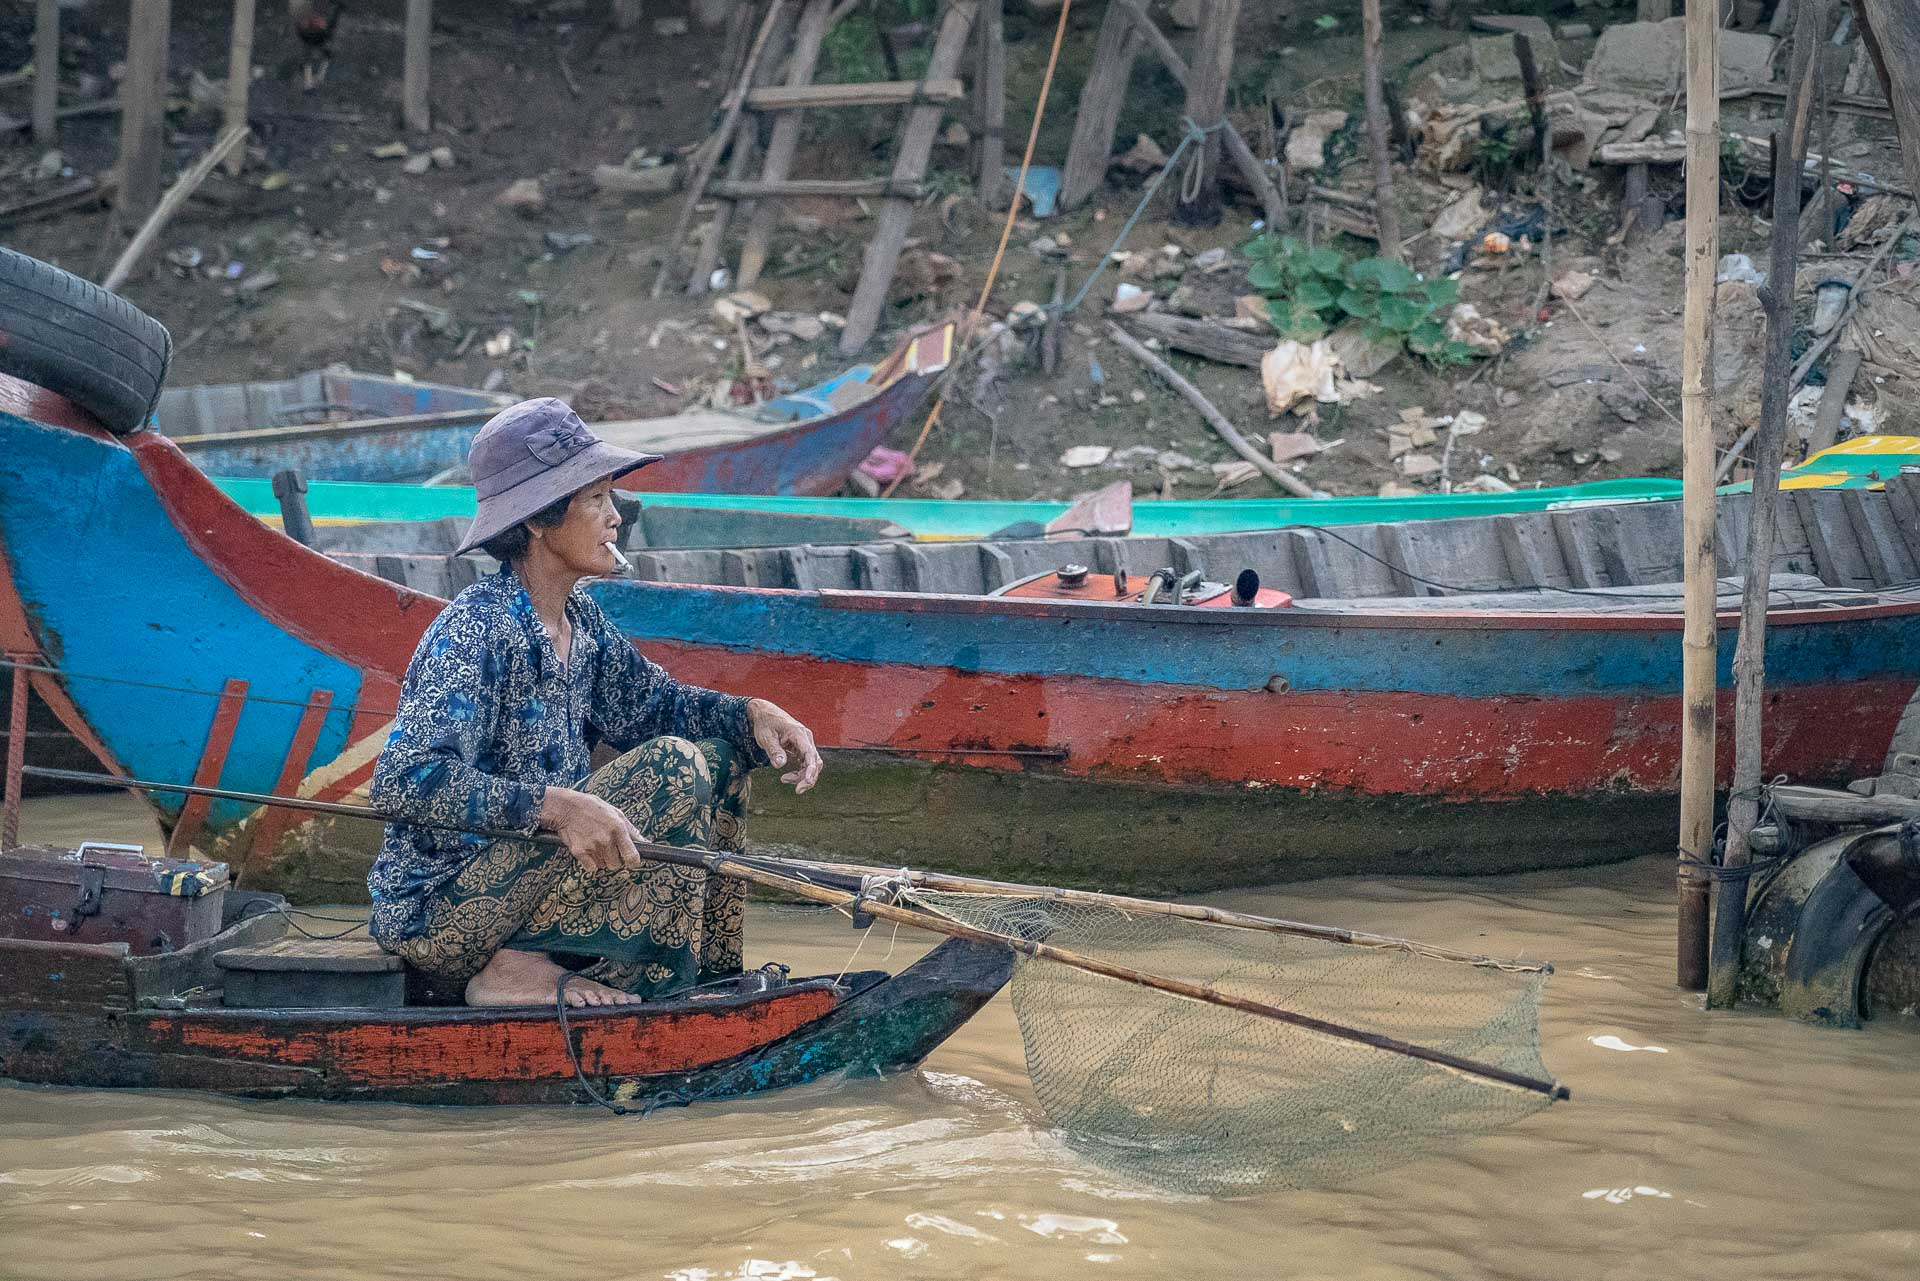 Lesvoyageuses-guide-voyage-siem-reap-angkor-cambodge-lavender-jeep-11